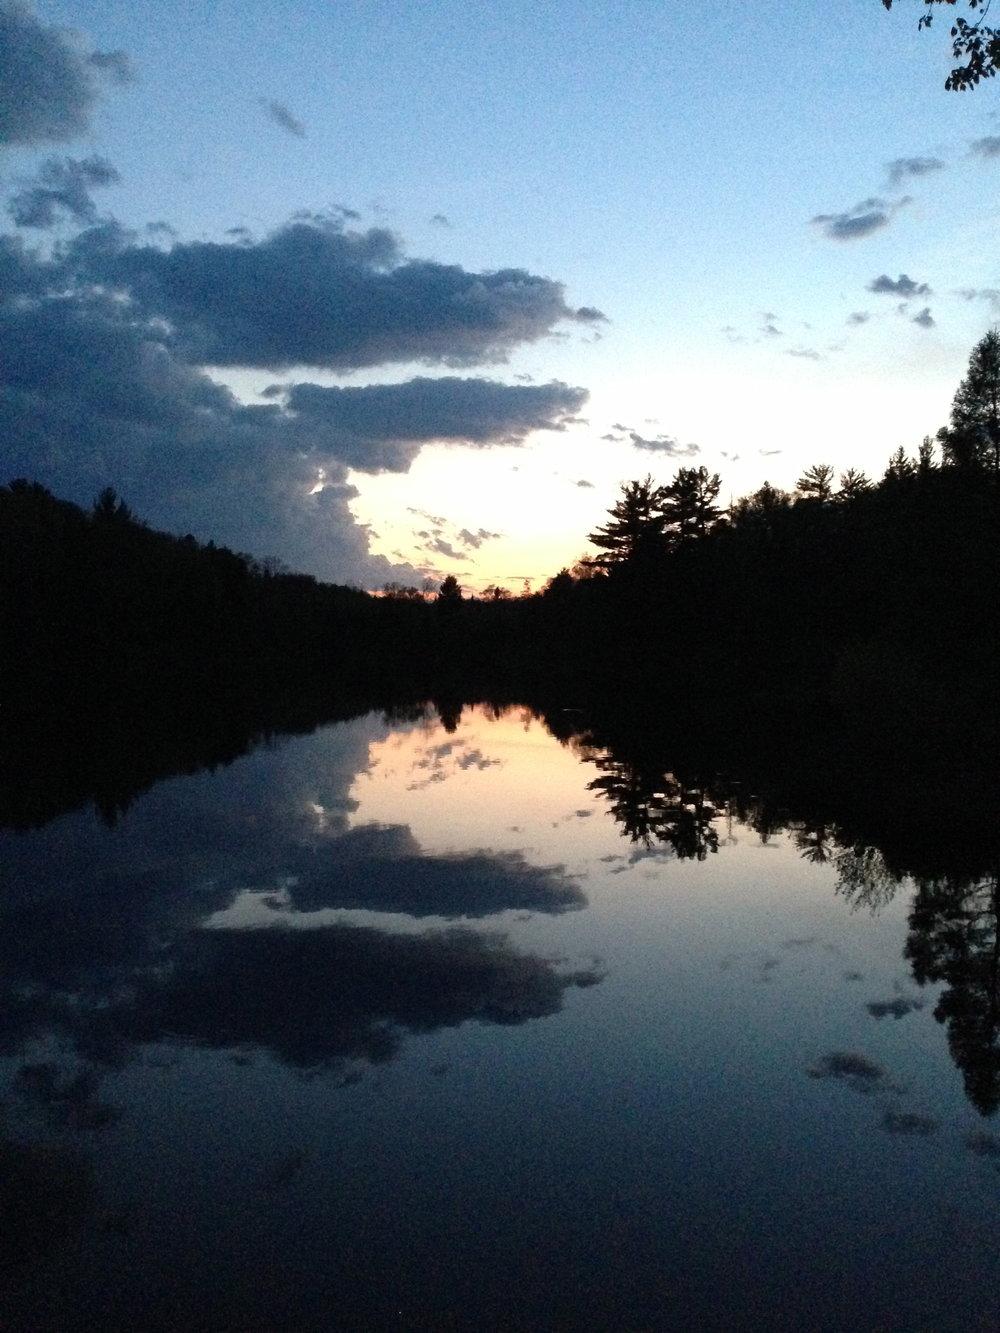 Camp 7 lake!